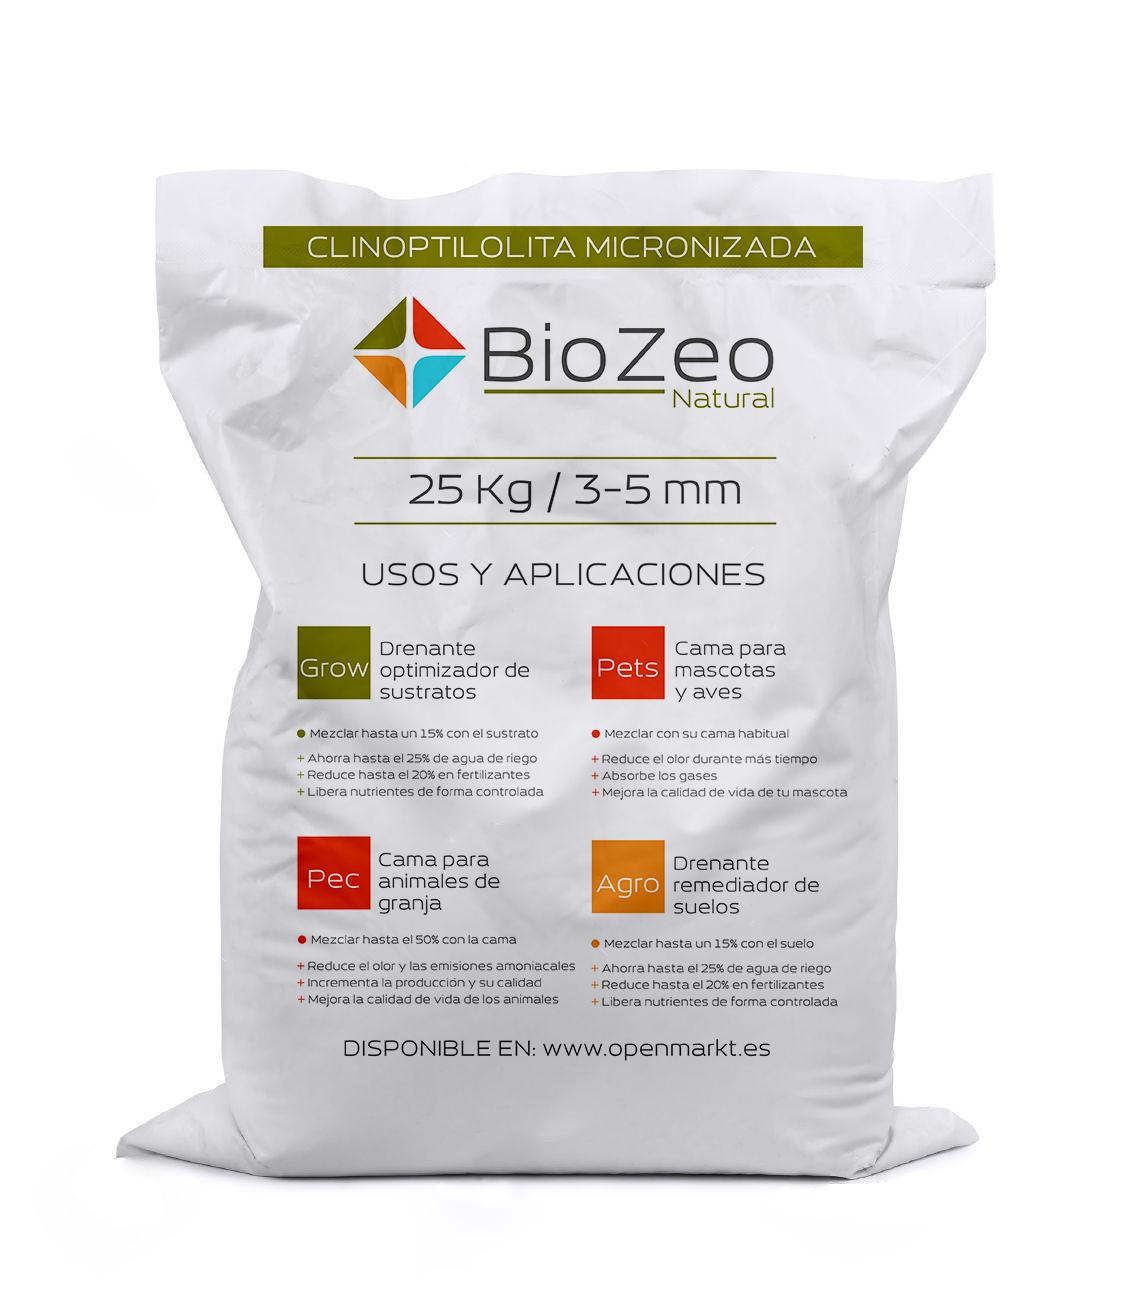 BioZeo NATURAL 3- 5 mm AGRO DRENANTE ACTIVO